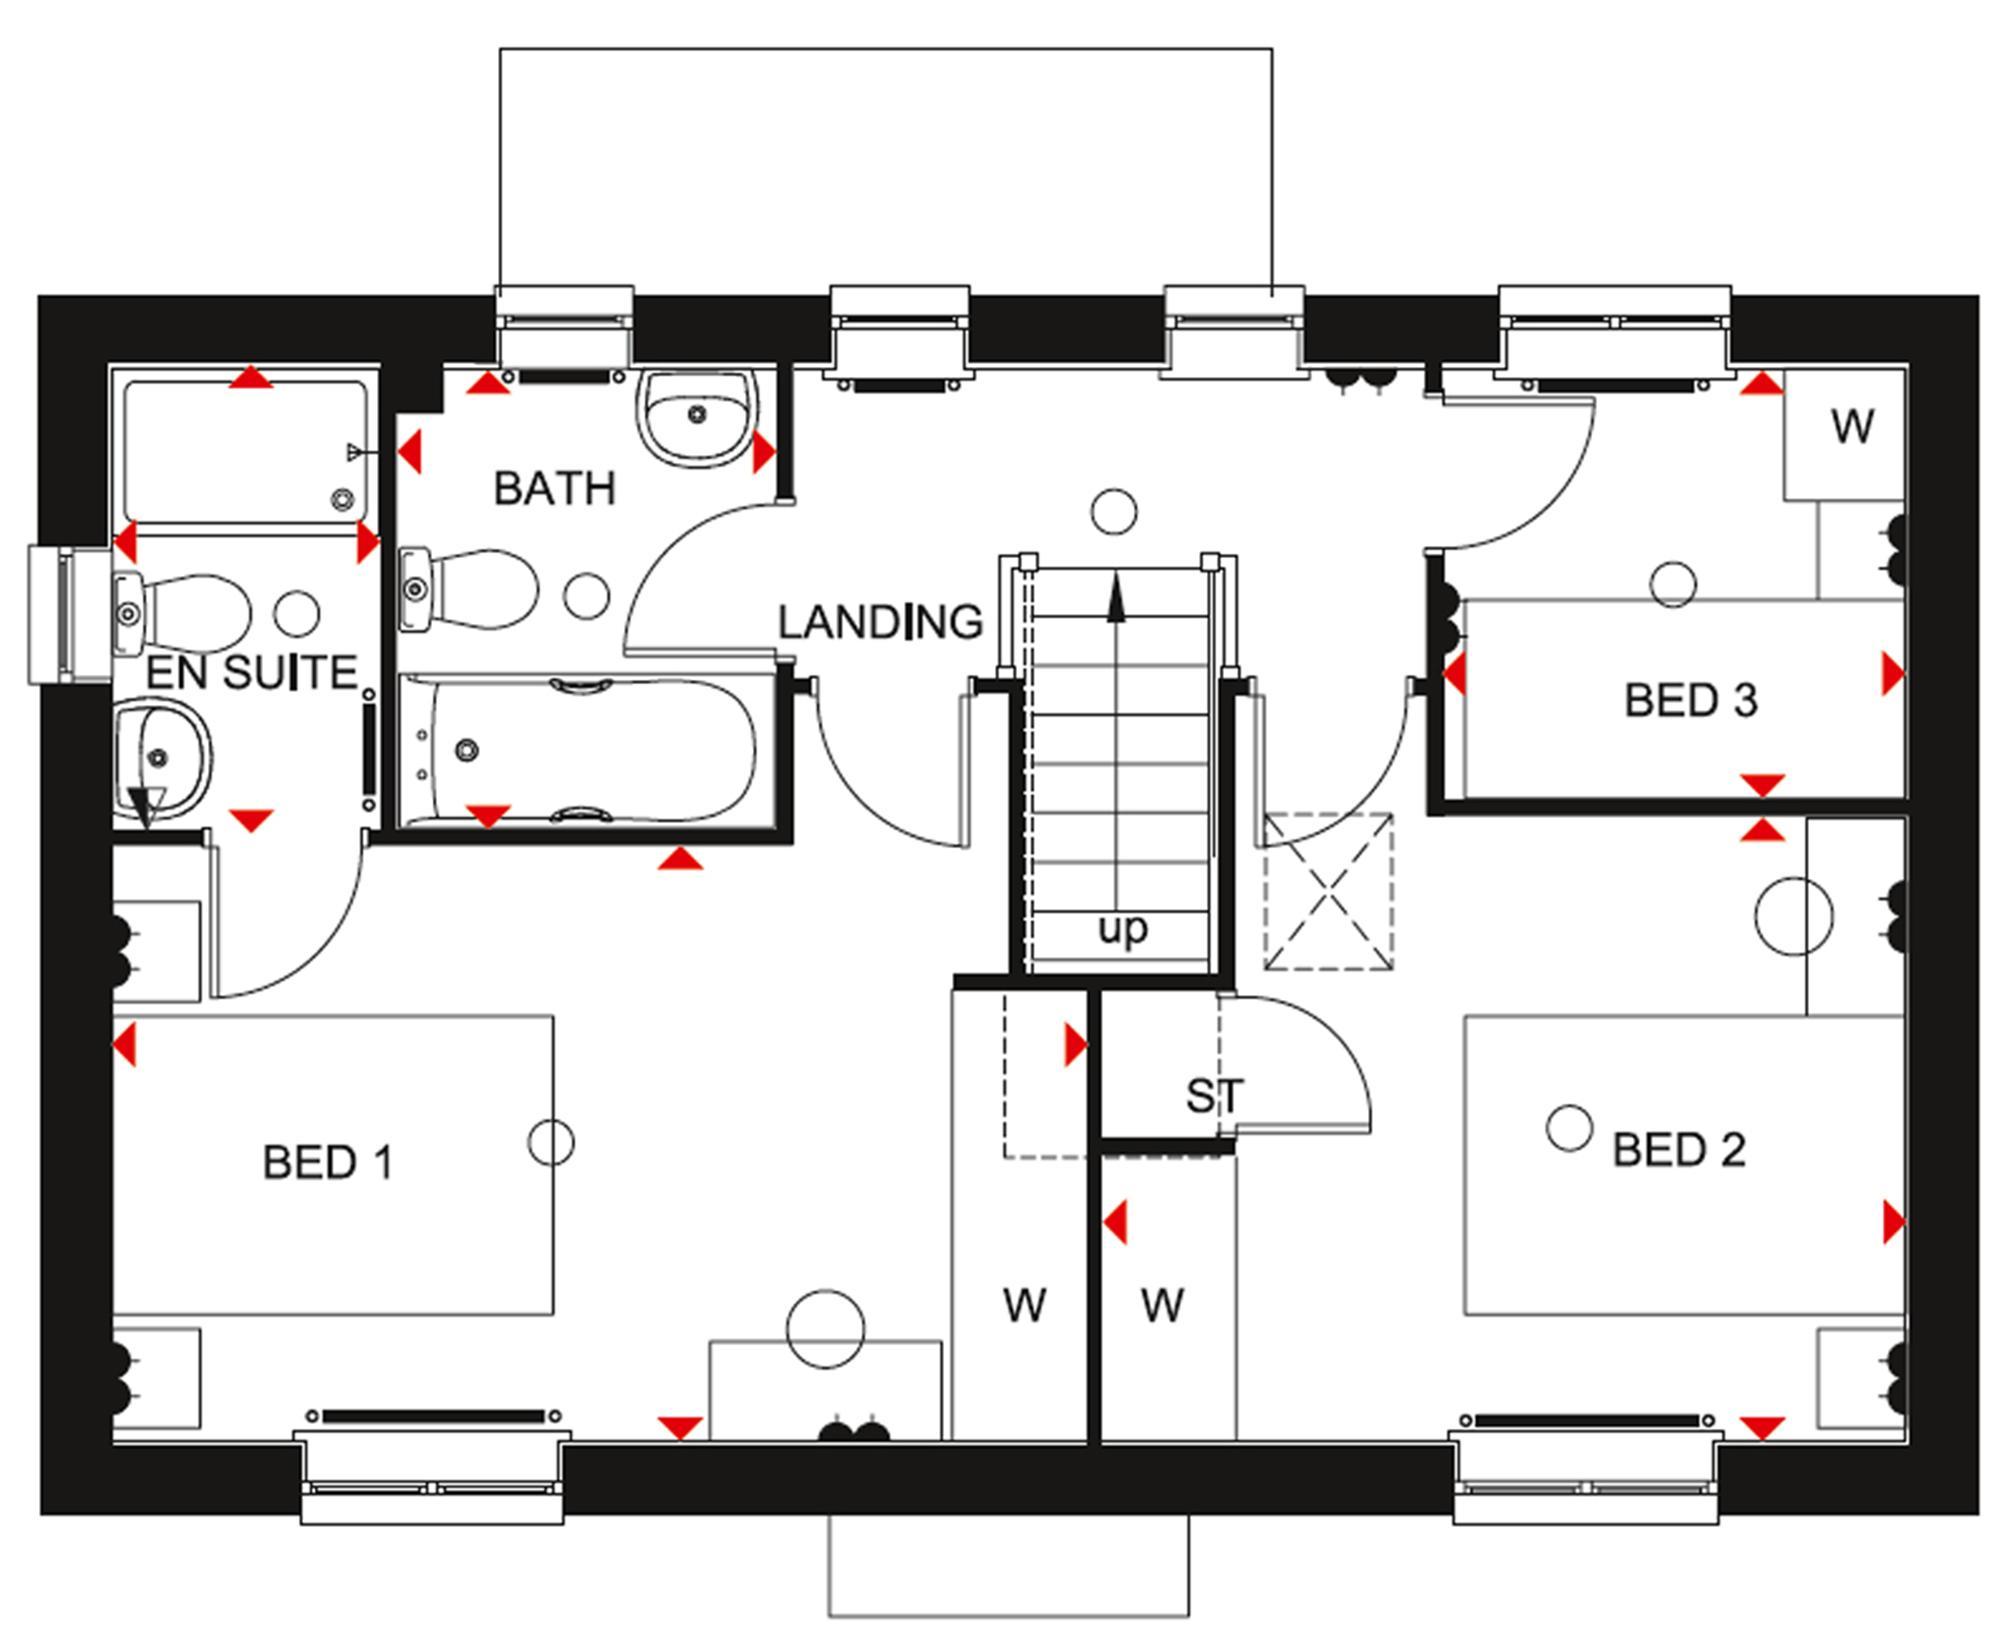 Detached House Plot 663 for 299995 in Longford Park Phase 3 in – Longford Homes Floor Plans